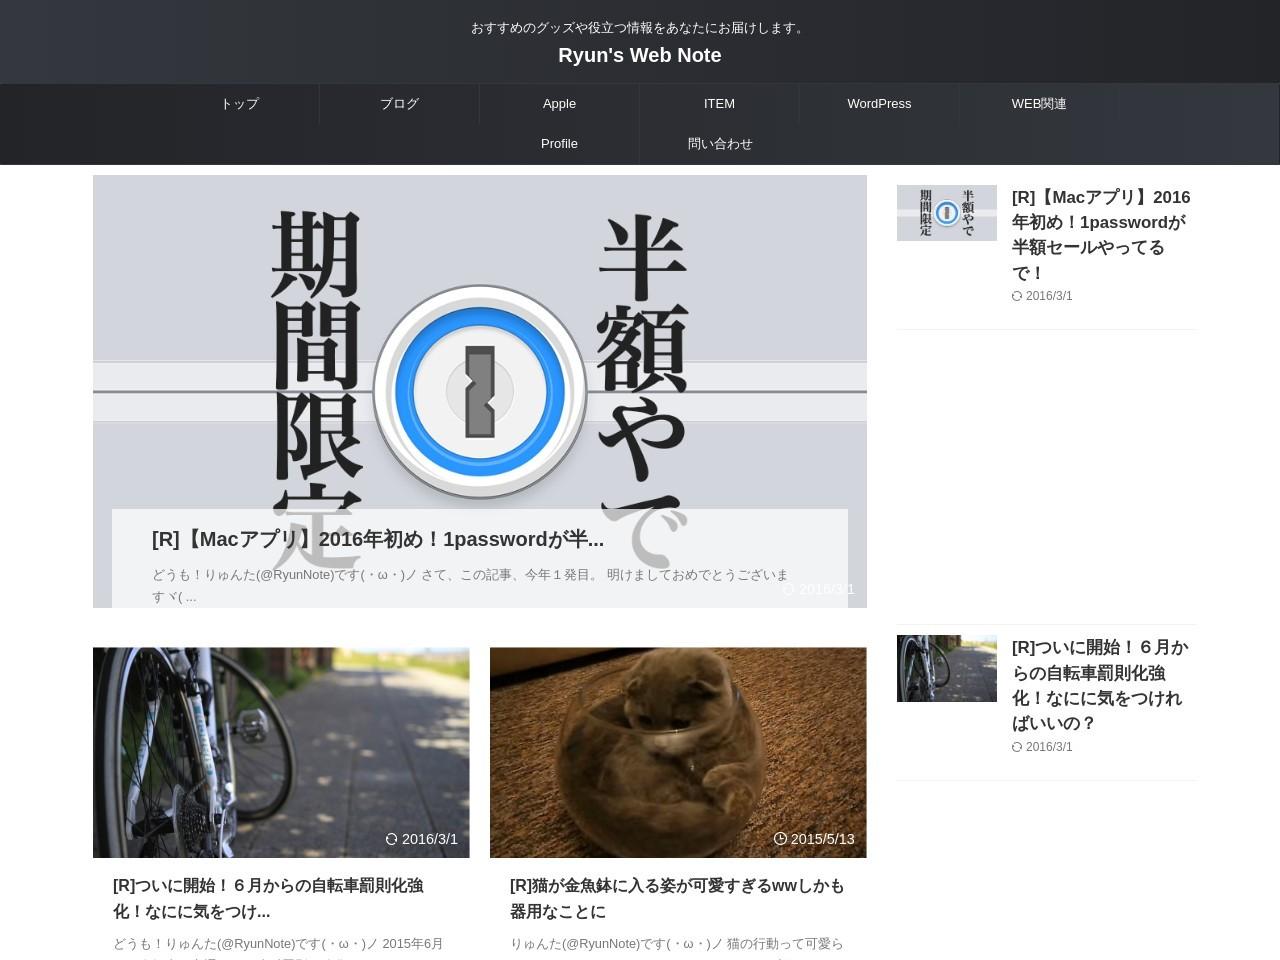 http://ryun-webnote.com/2013/11/03/sample-get/